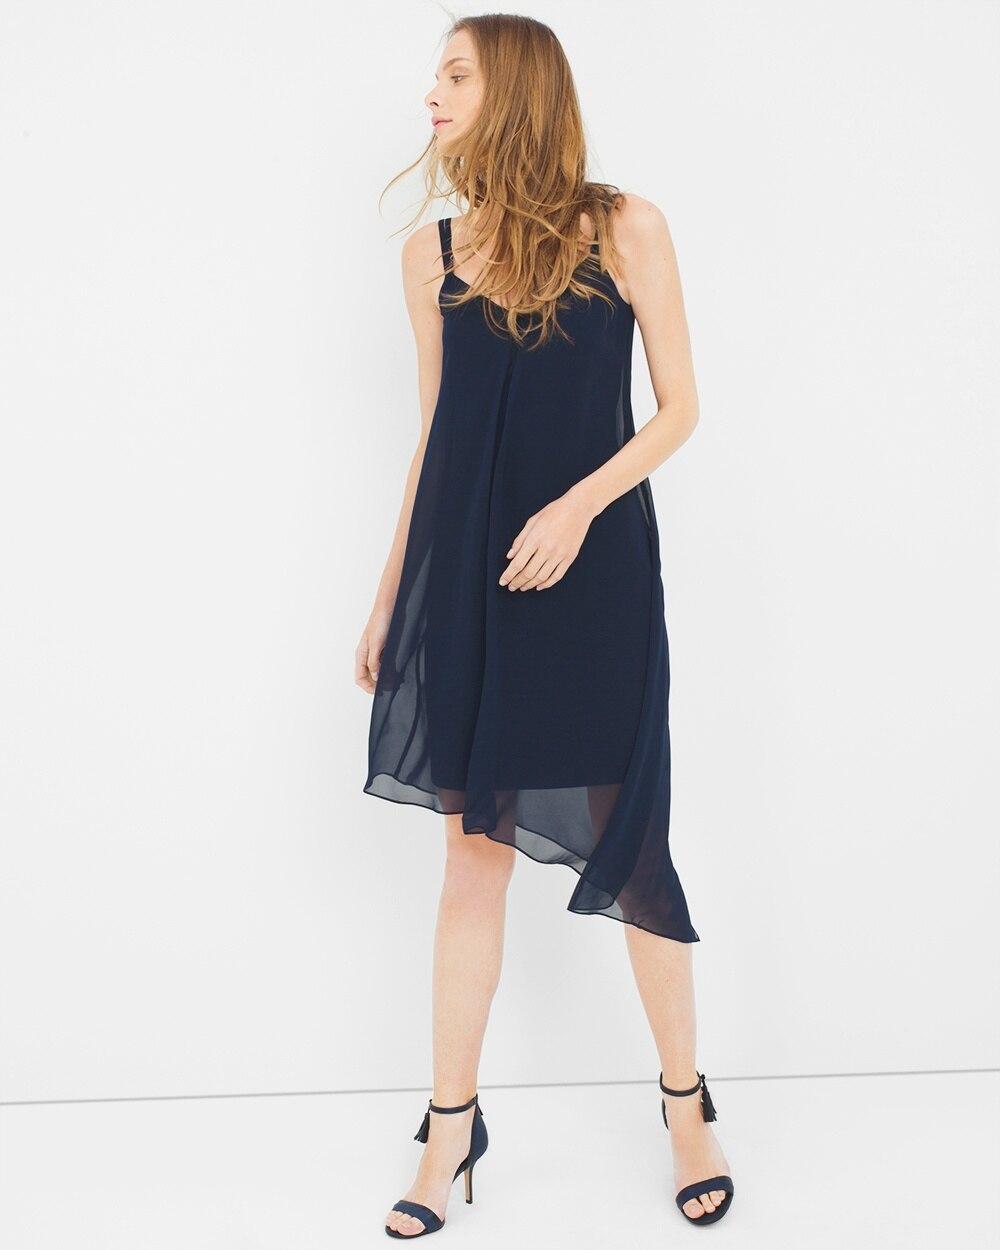 b1bfceda9b576 Asymmetric Chiffon Midi Dress - White House Black Market